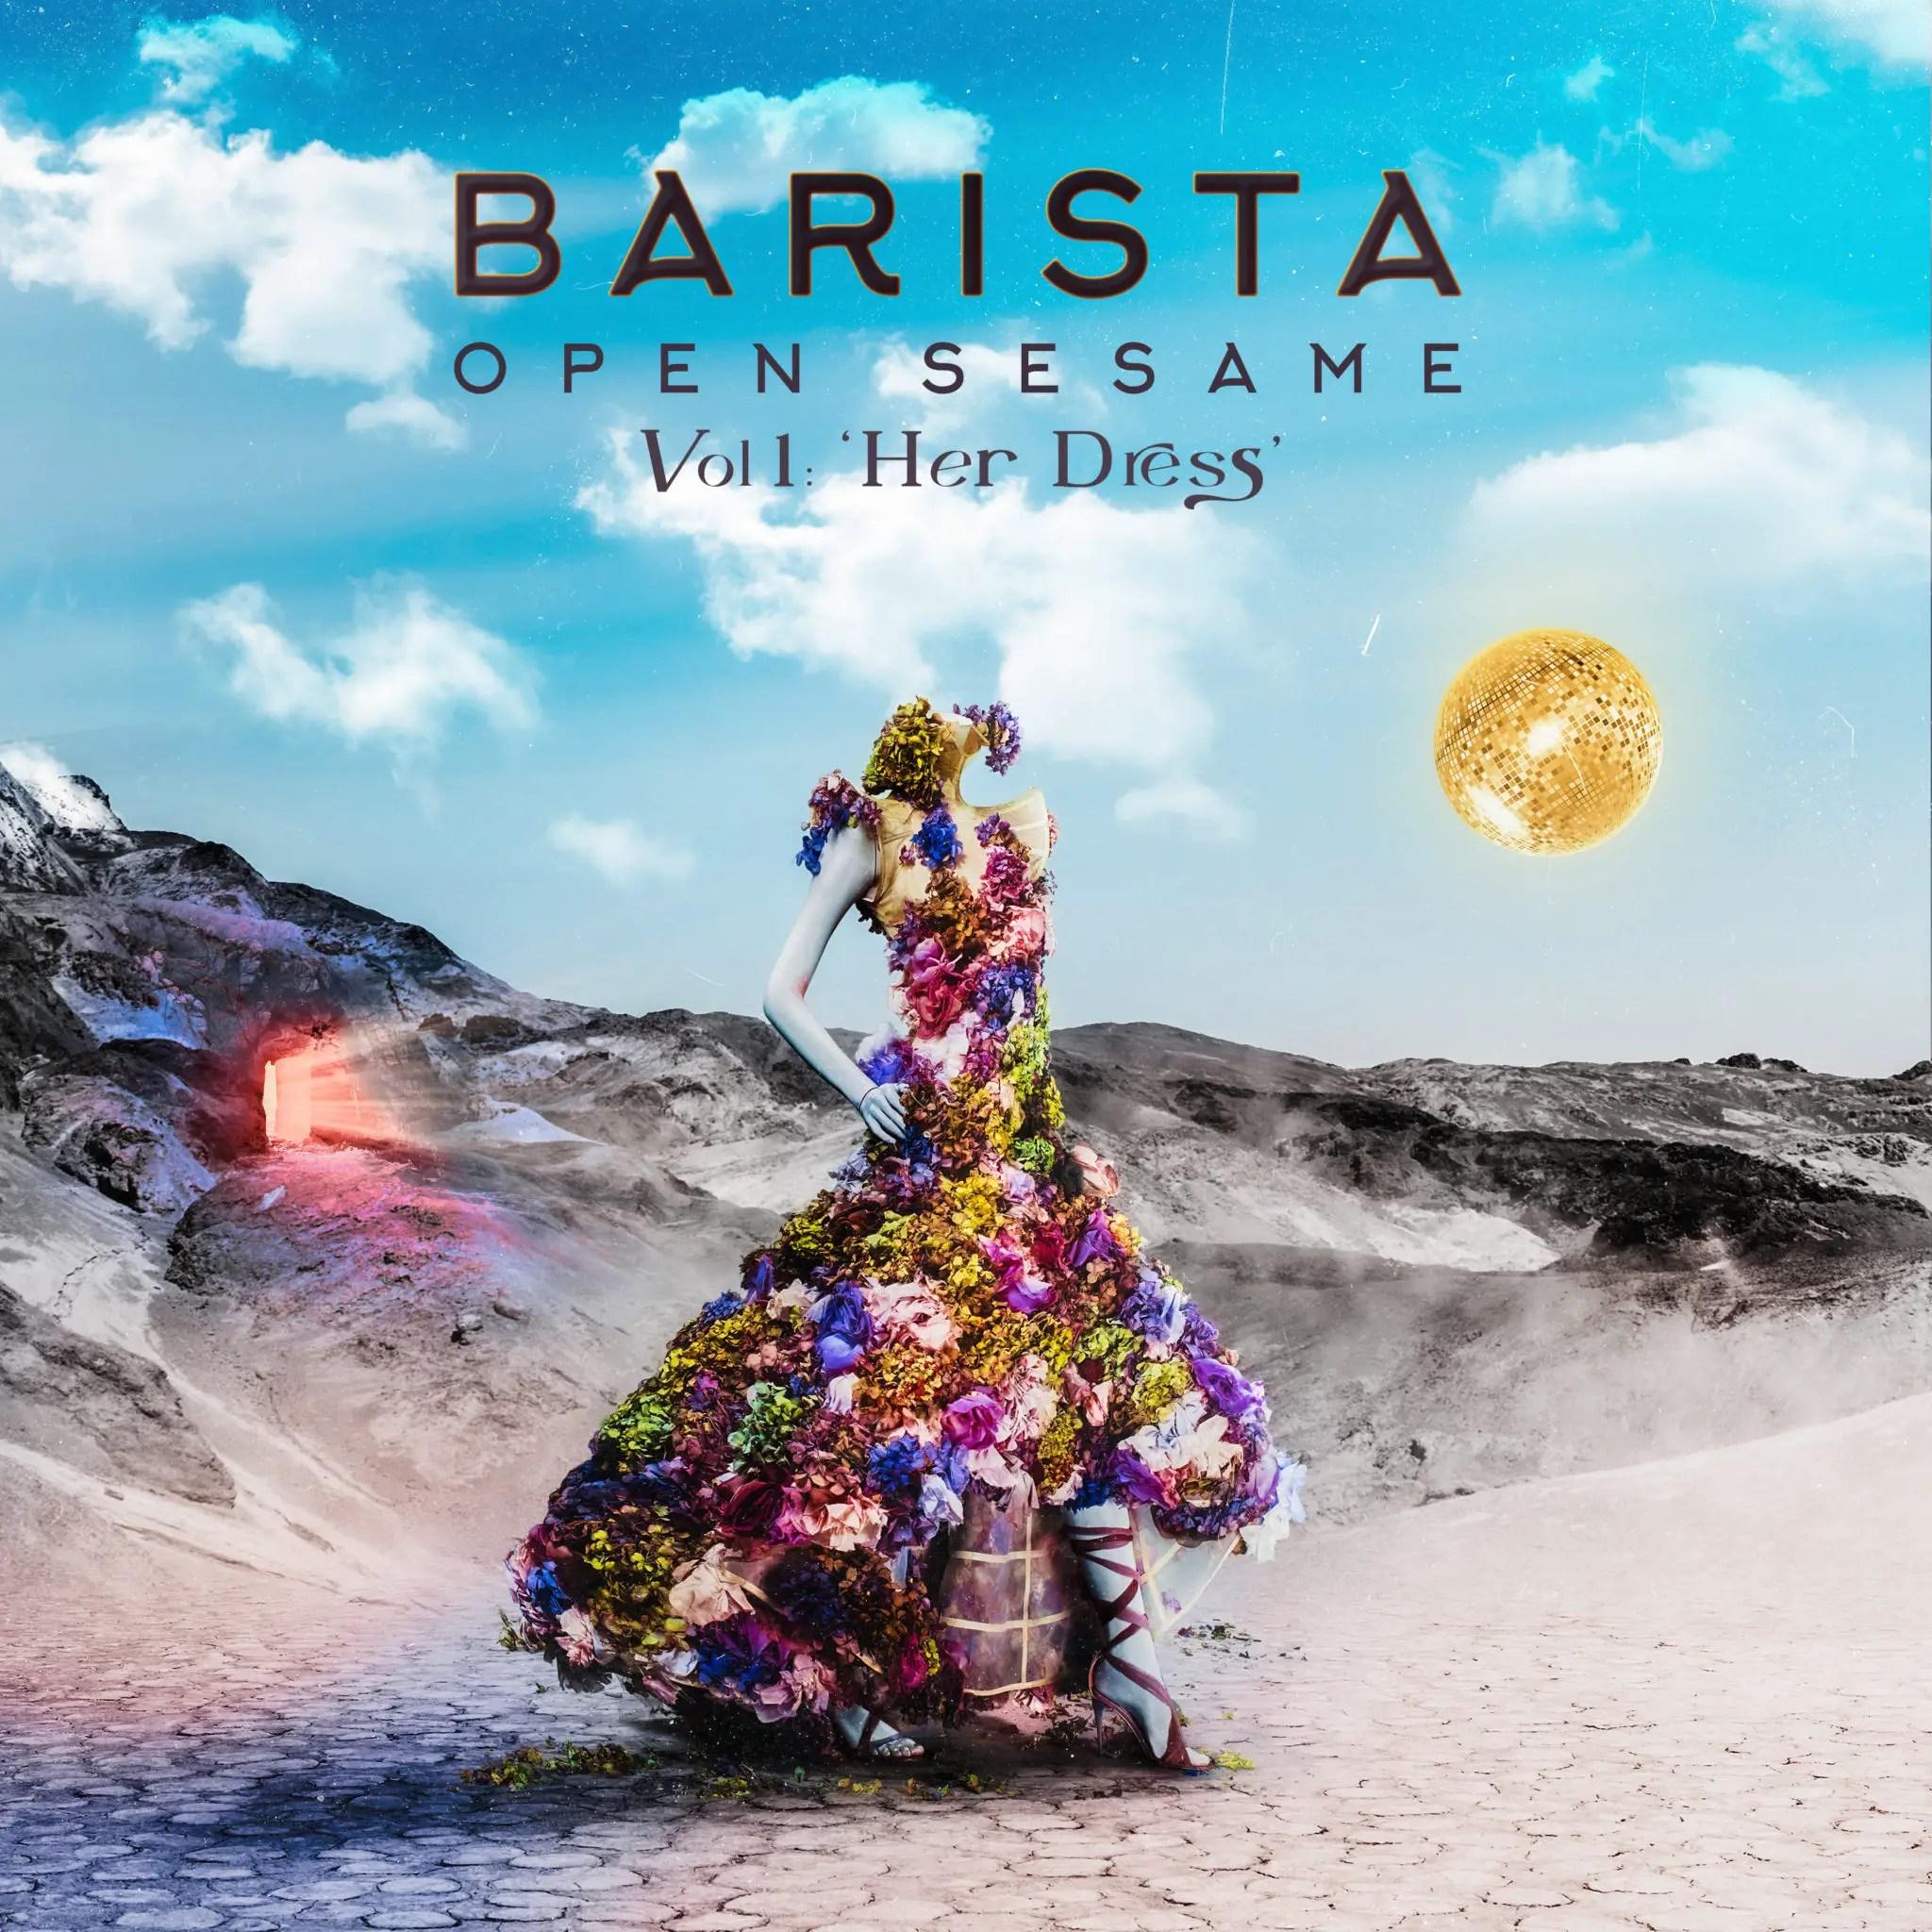 Barista - 'Open Sesame Vol 1: Her Dress' Reaction | Opinions | LIVING LIFE FEARLESS